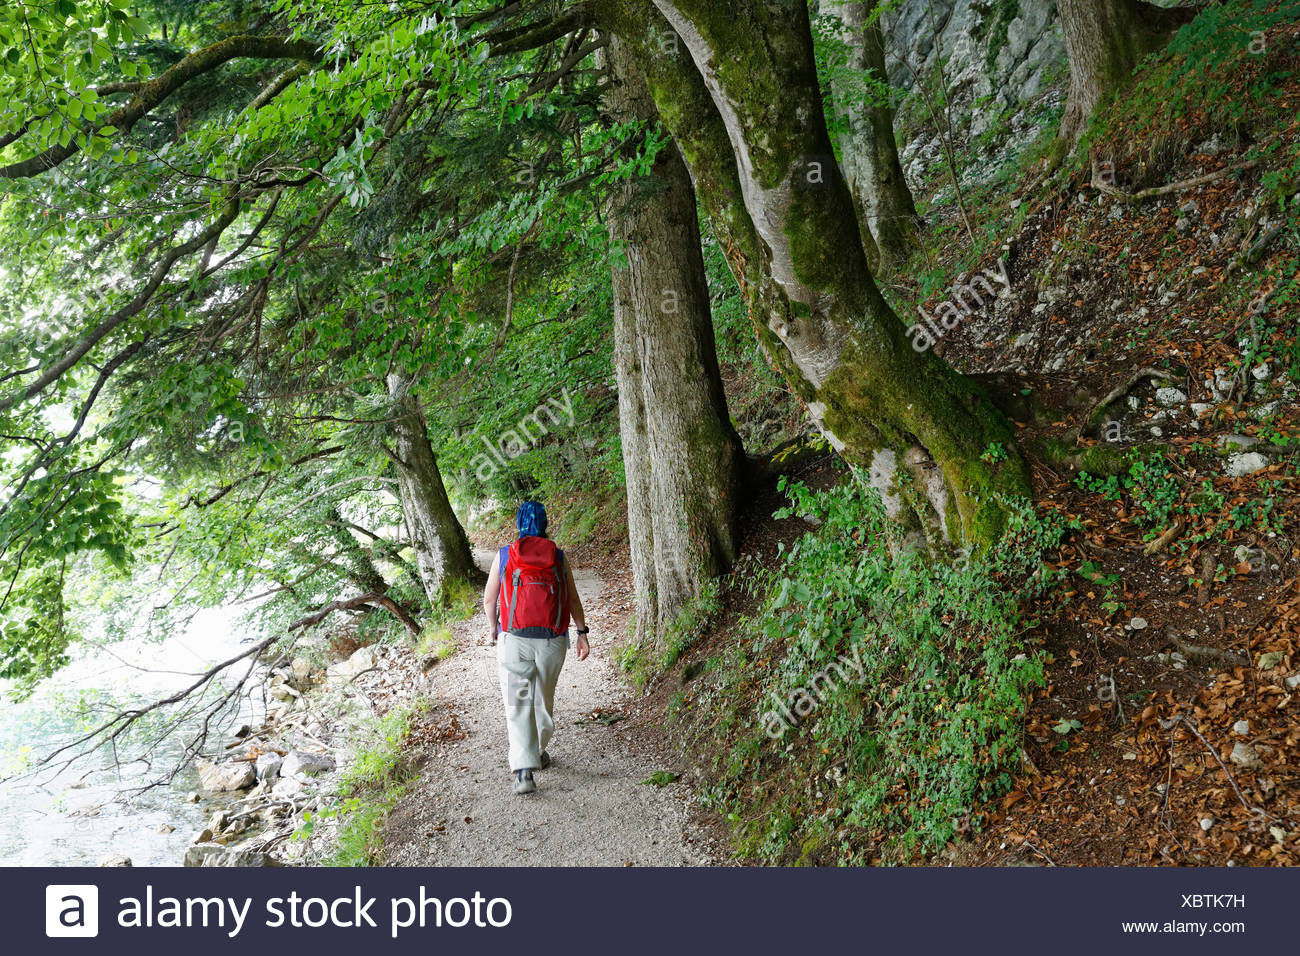 Austria, Salzkammergut, Salzburg State, Sankt Gilgen, Brunnwinkl, Female hiker at Lake Wolfgangsee - Stock Image